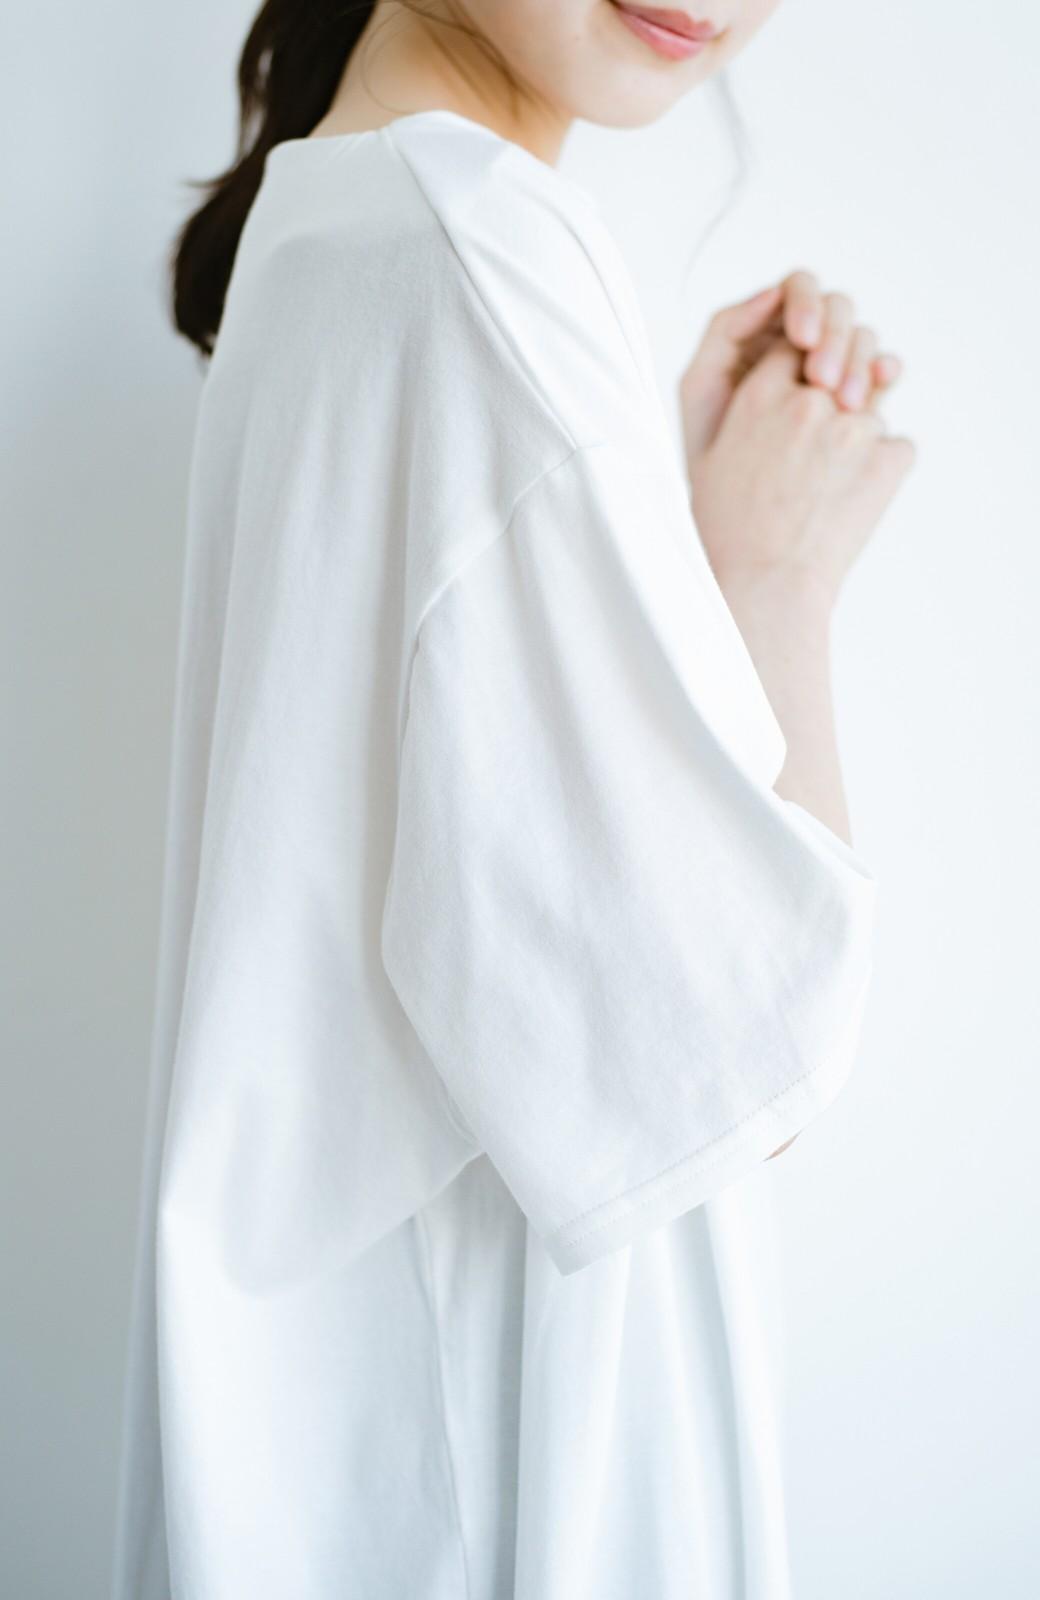 haco! 女の子バンザイ!プロジェクト【まったり期~もやもや期】PBPオーガニックコットンのとにかく動きやすくてラクチンなTシャツワンピース&レギンスセット <ホワイト>の商品写真7